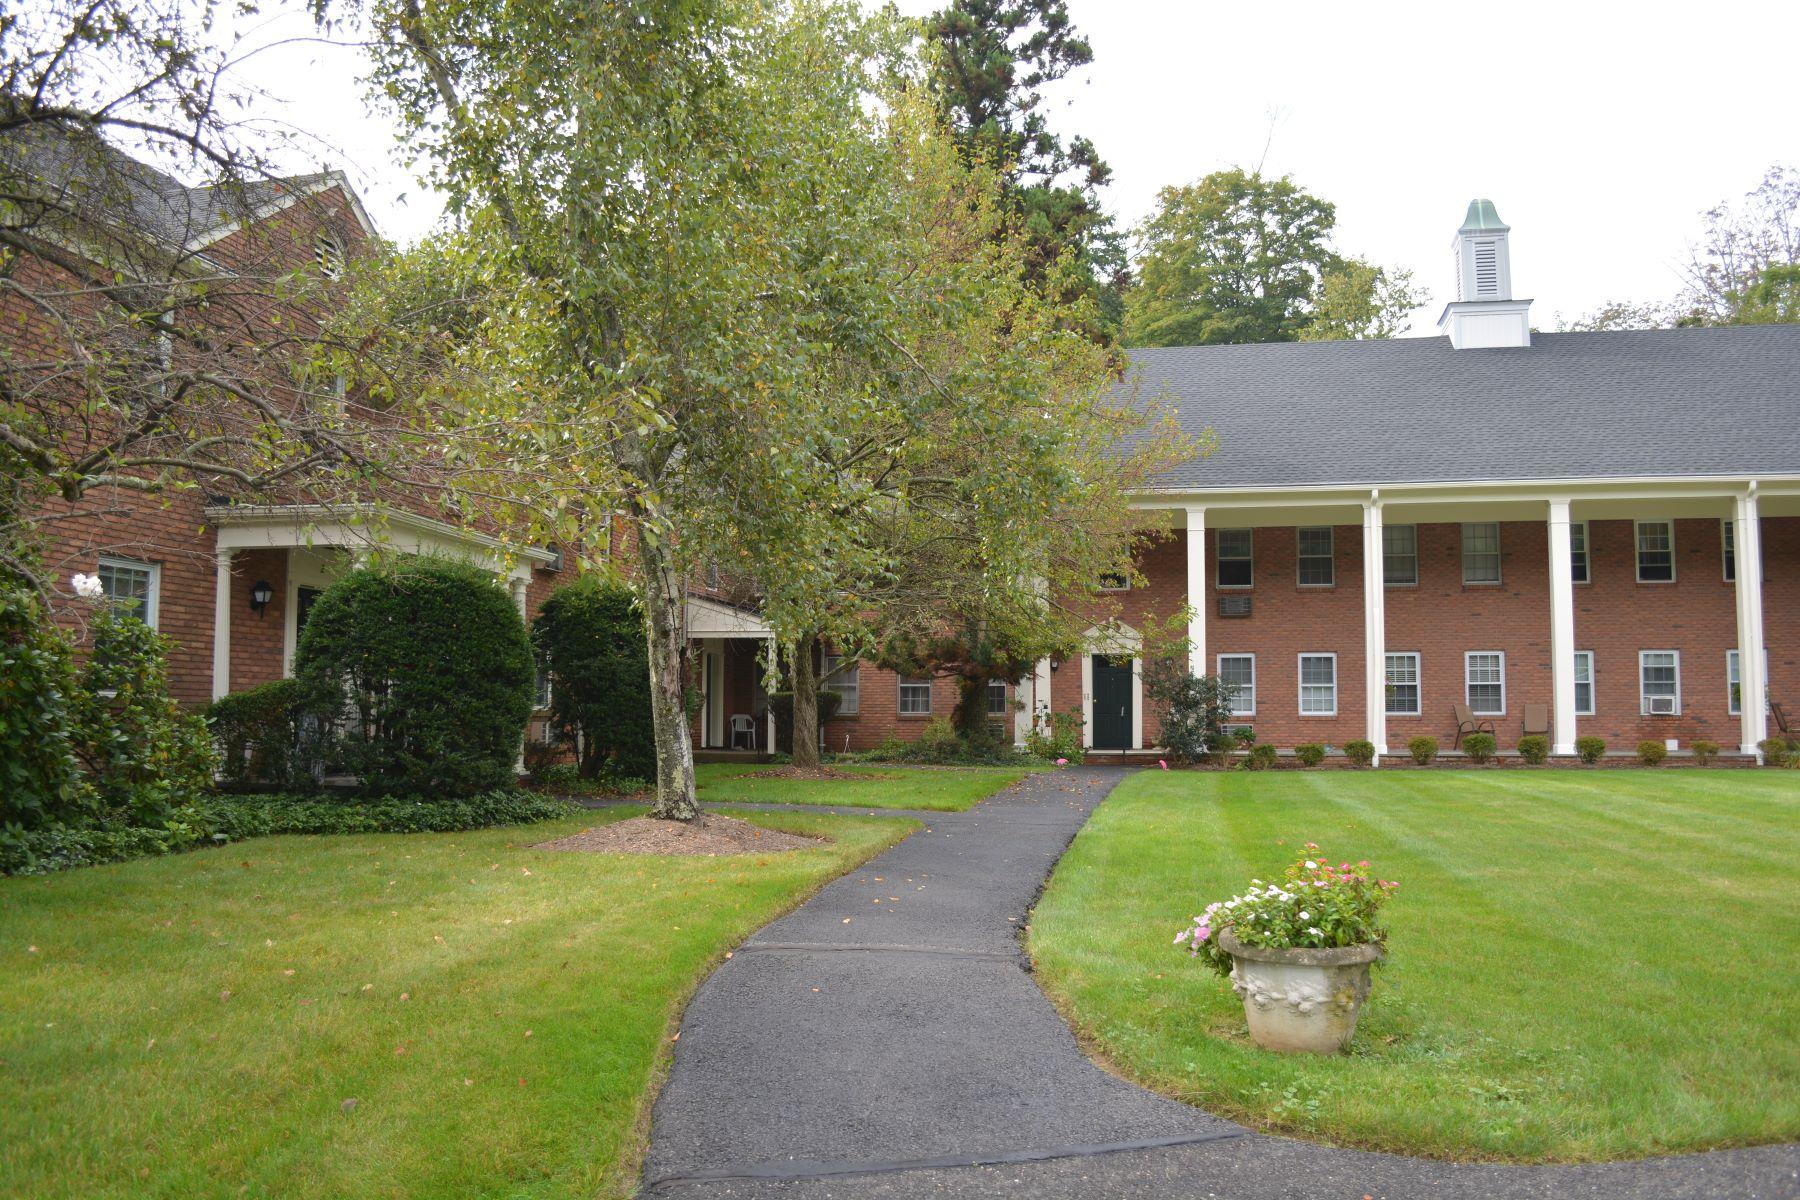 Condominium for Rent at Great Location! 132 Claremont Road, Unit 2D Bernardsville, New Jersey, 07924 United States